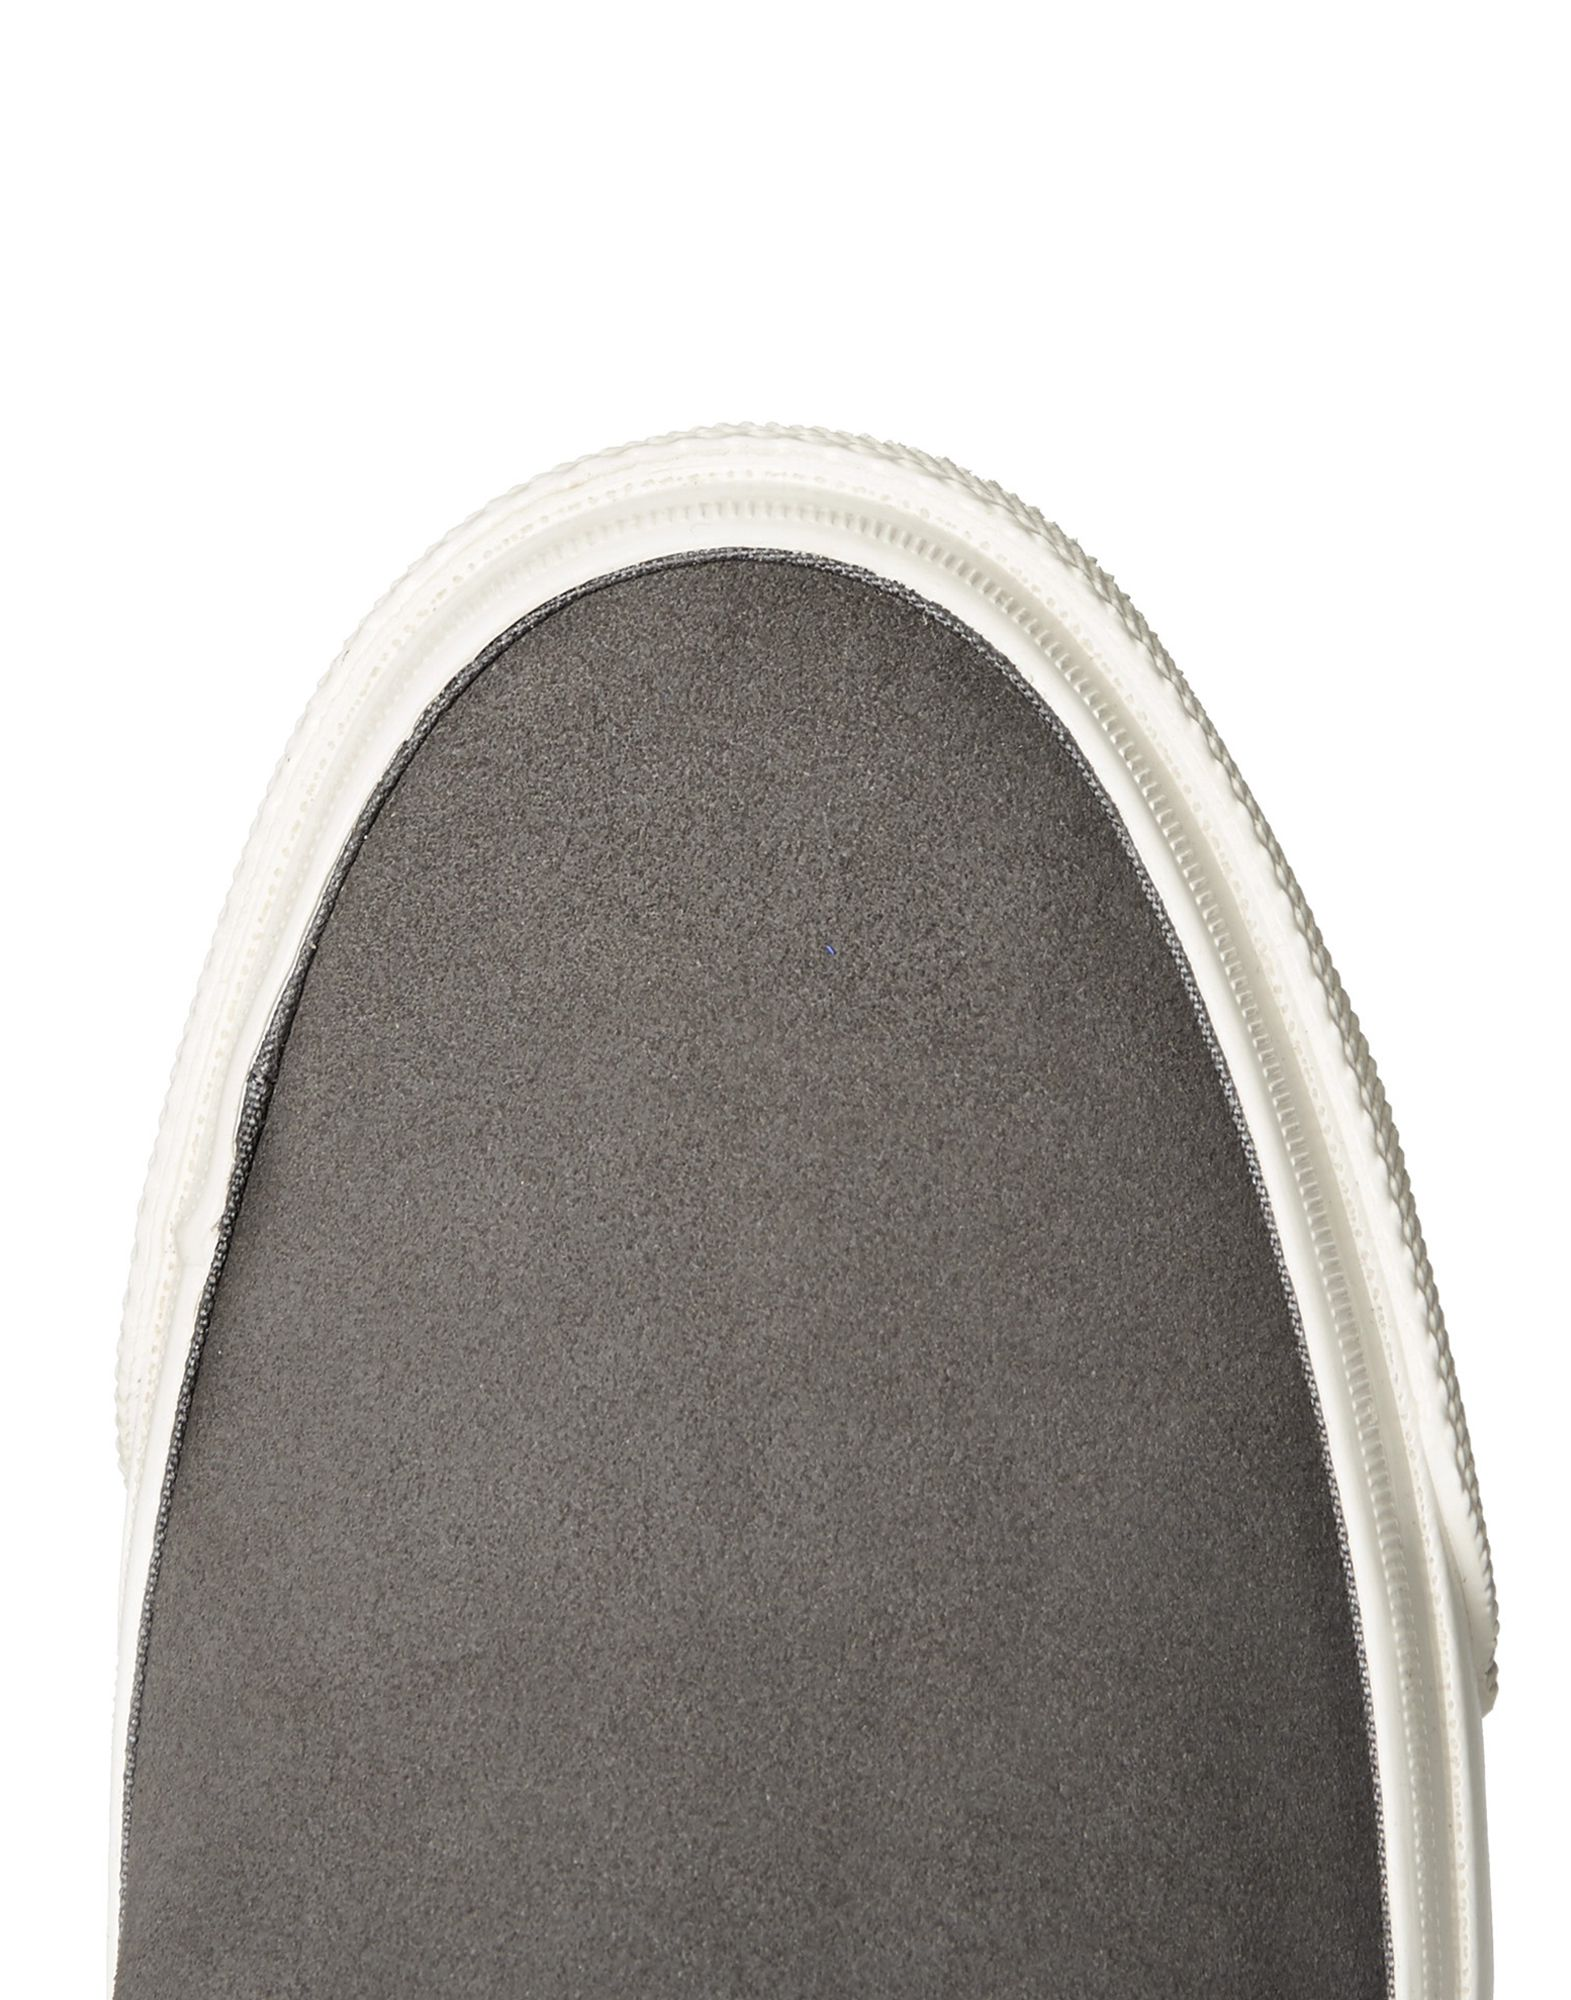 Rabatt echte Schuhe Herren Converse All Star Sneakers Herren Schuhe  11540849VT 50d224